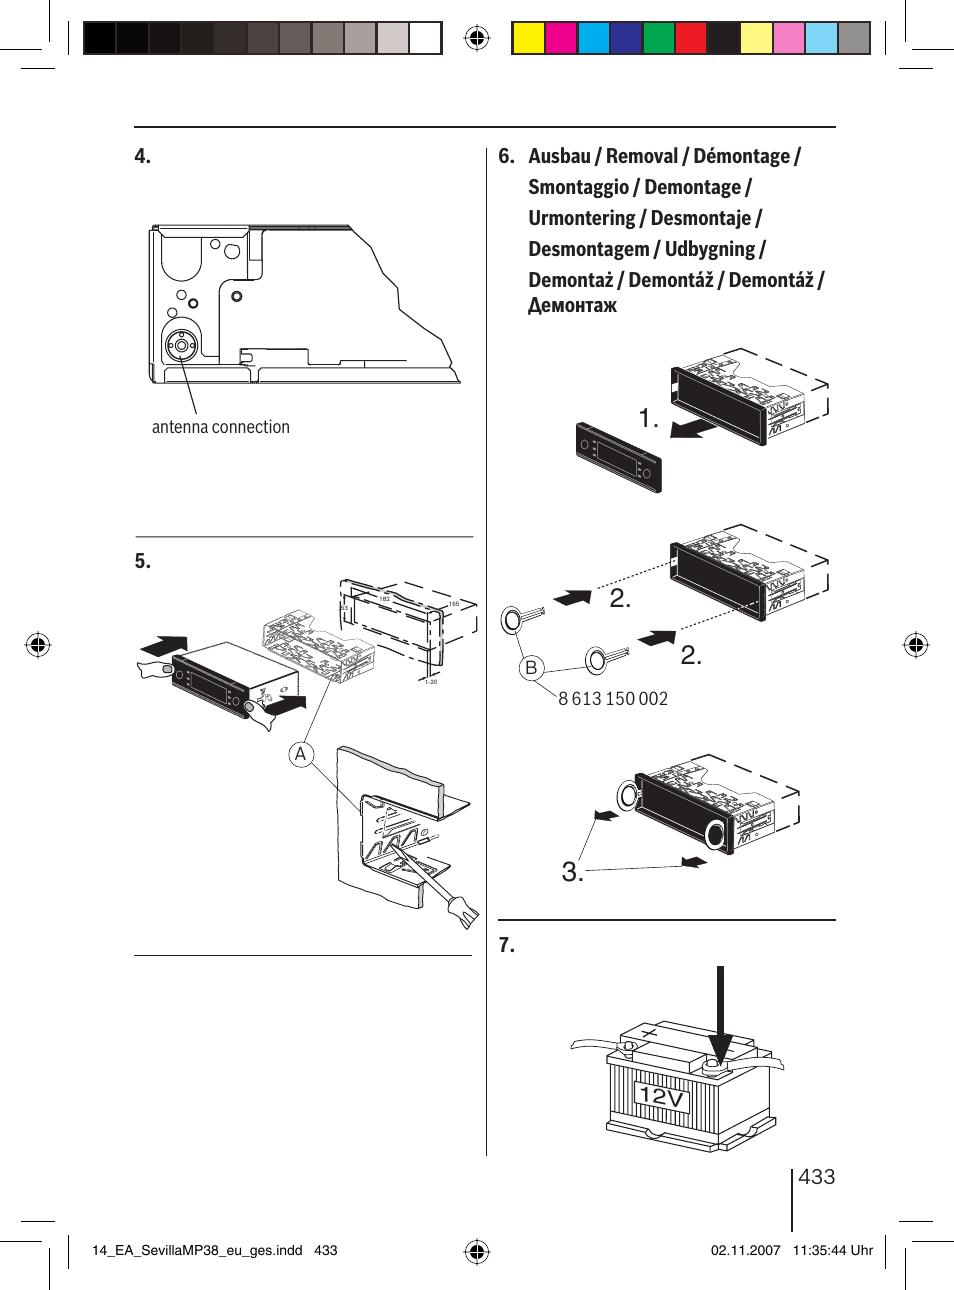 Инструкция по эксплуатации Blaupunkt SEVILLA MP38